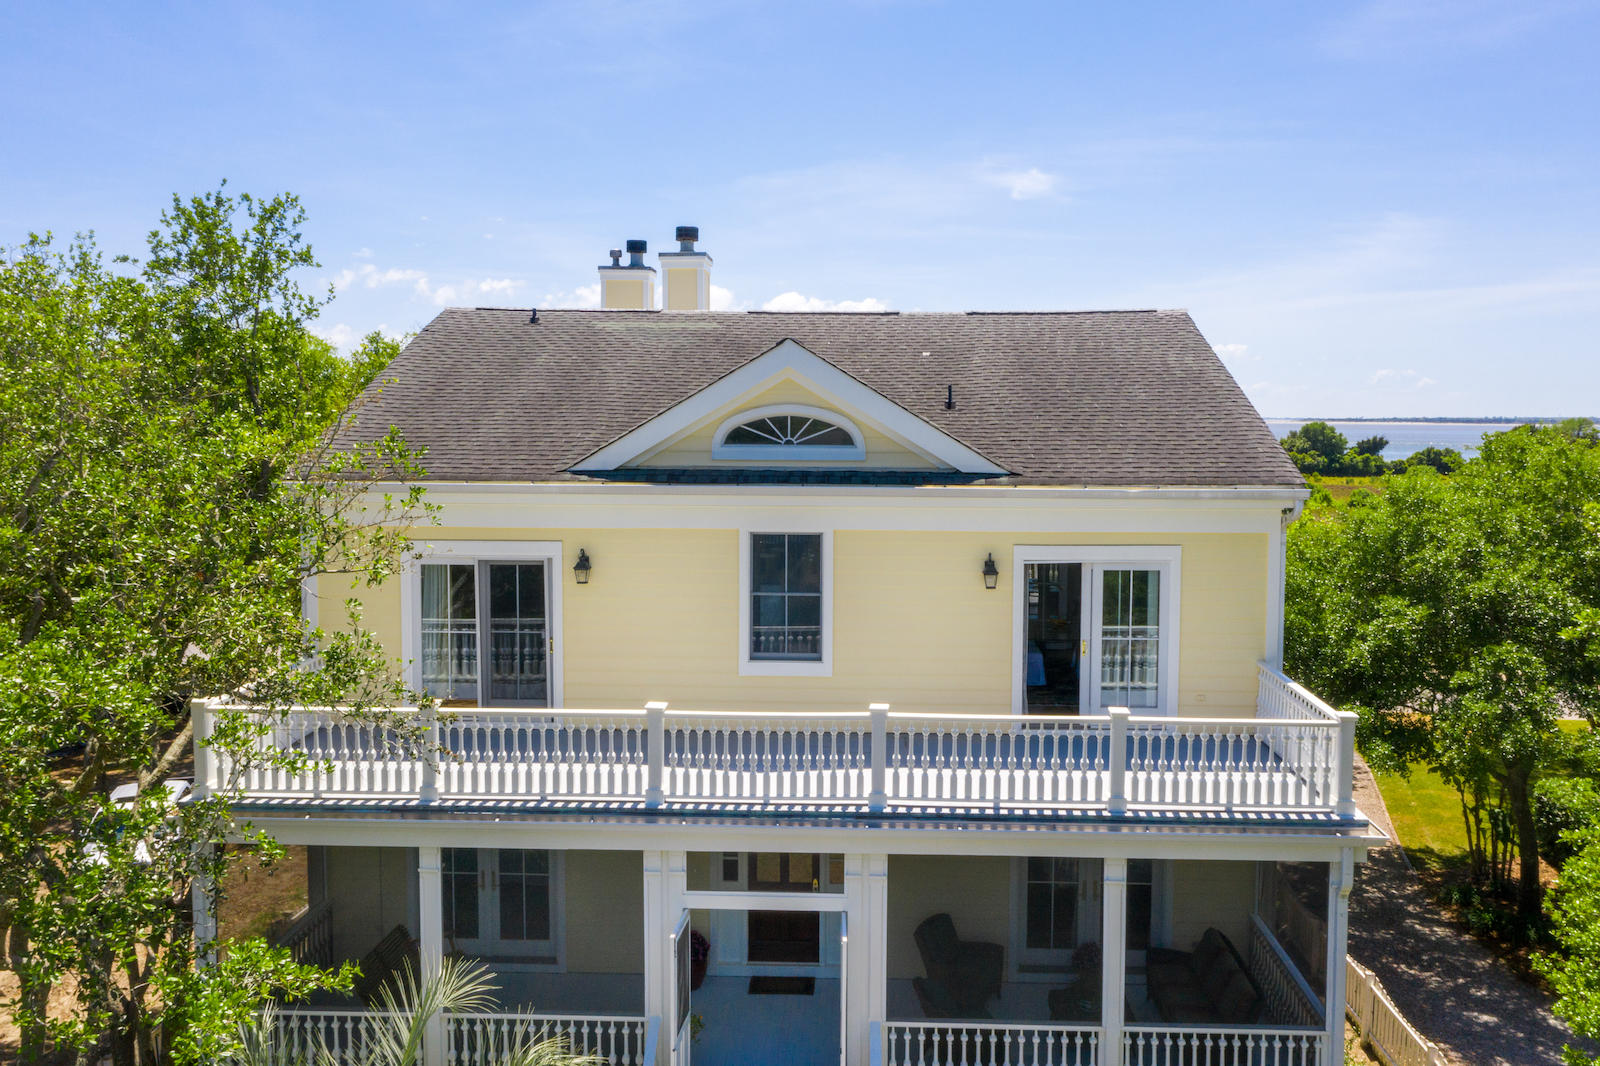 Sullivans Island Homes For Sale - 1318 Poe, Sullivans Island, SC - 17